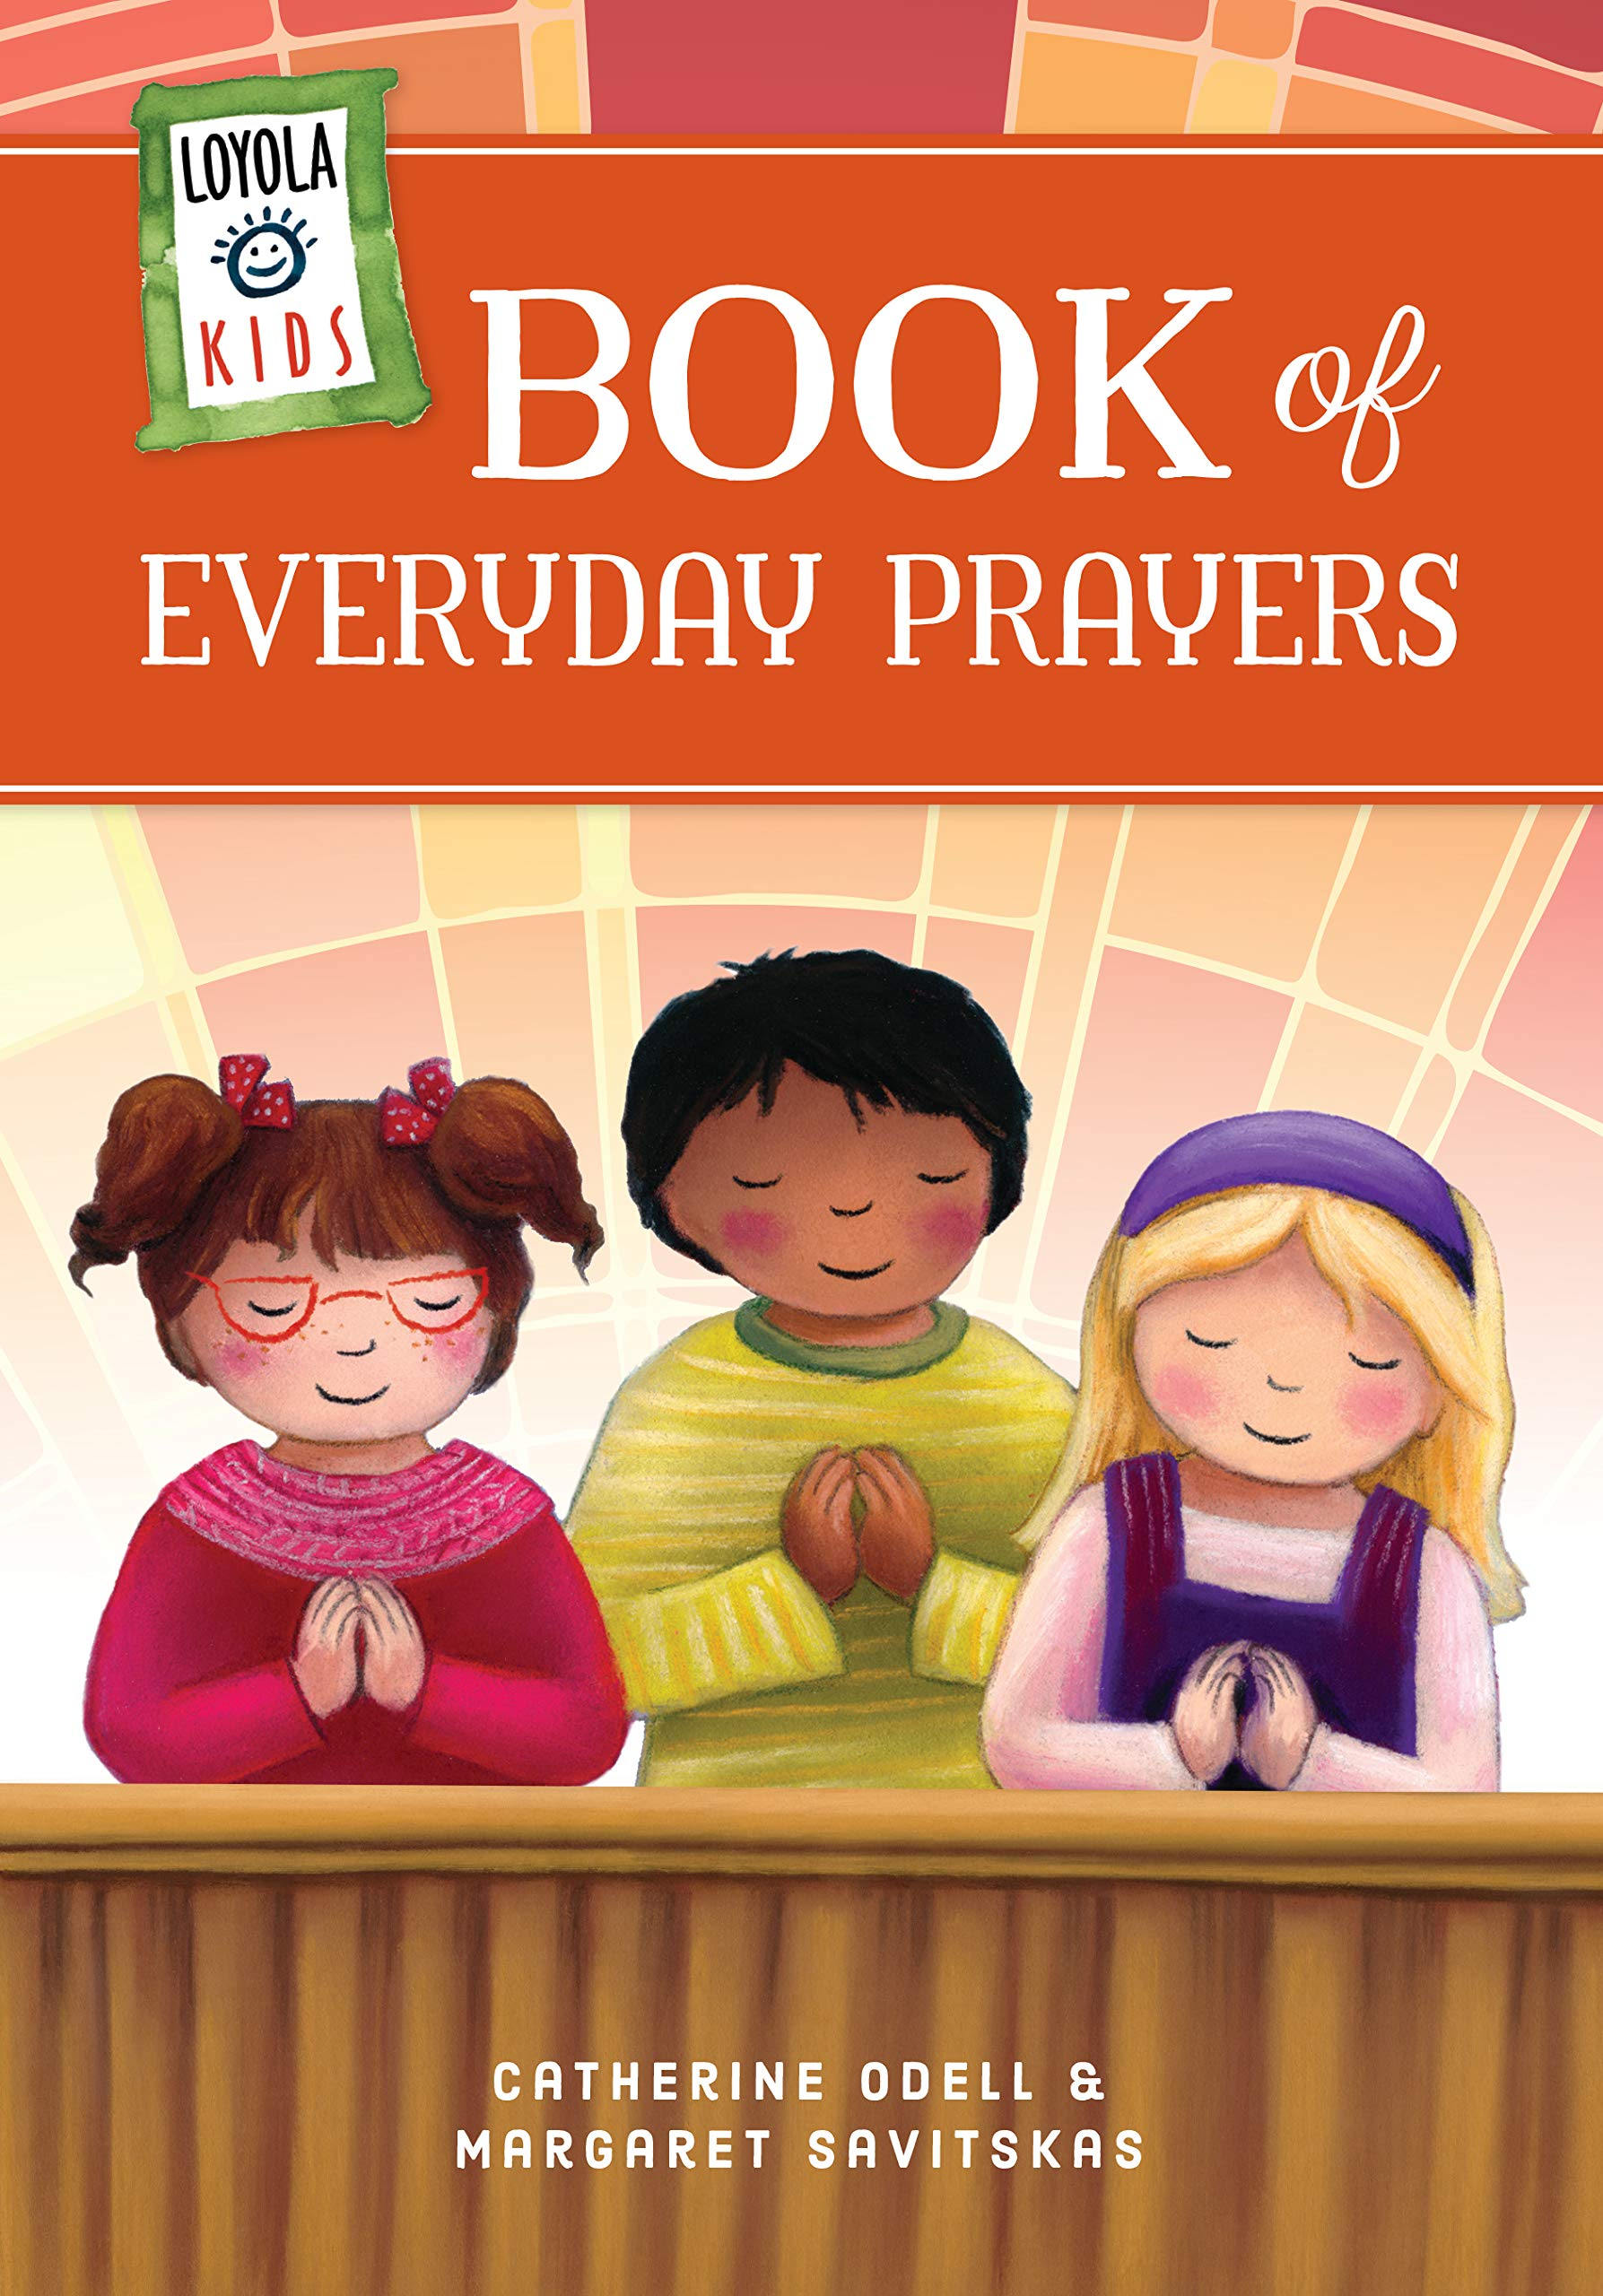 Loyola Kids Book of Everyday Prayers: Margaret Savitskas, Catherine Odell:  9780829415094: Amazon.com: Books